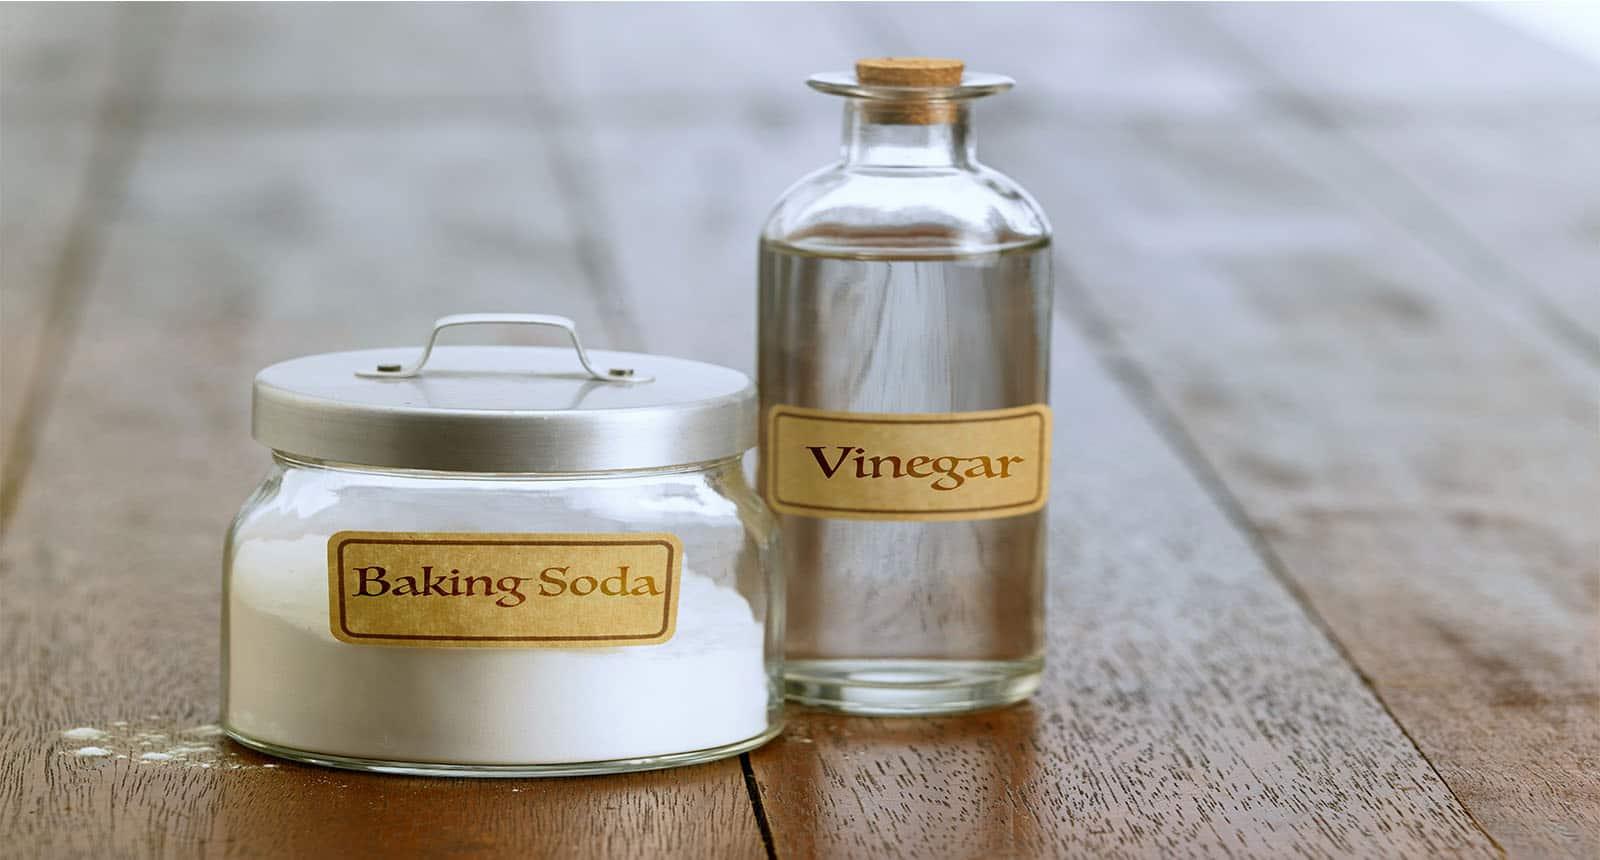 Baking Soda White Vinegar